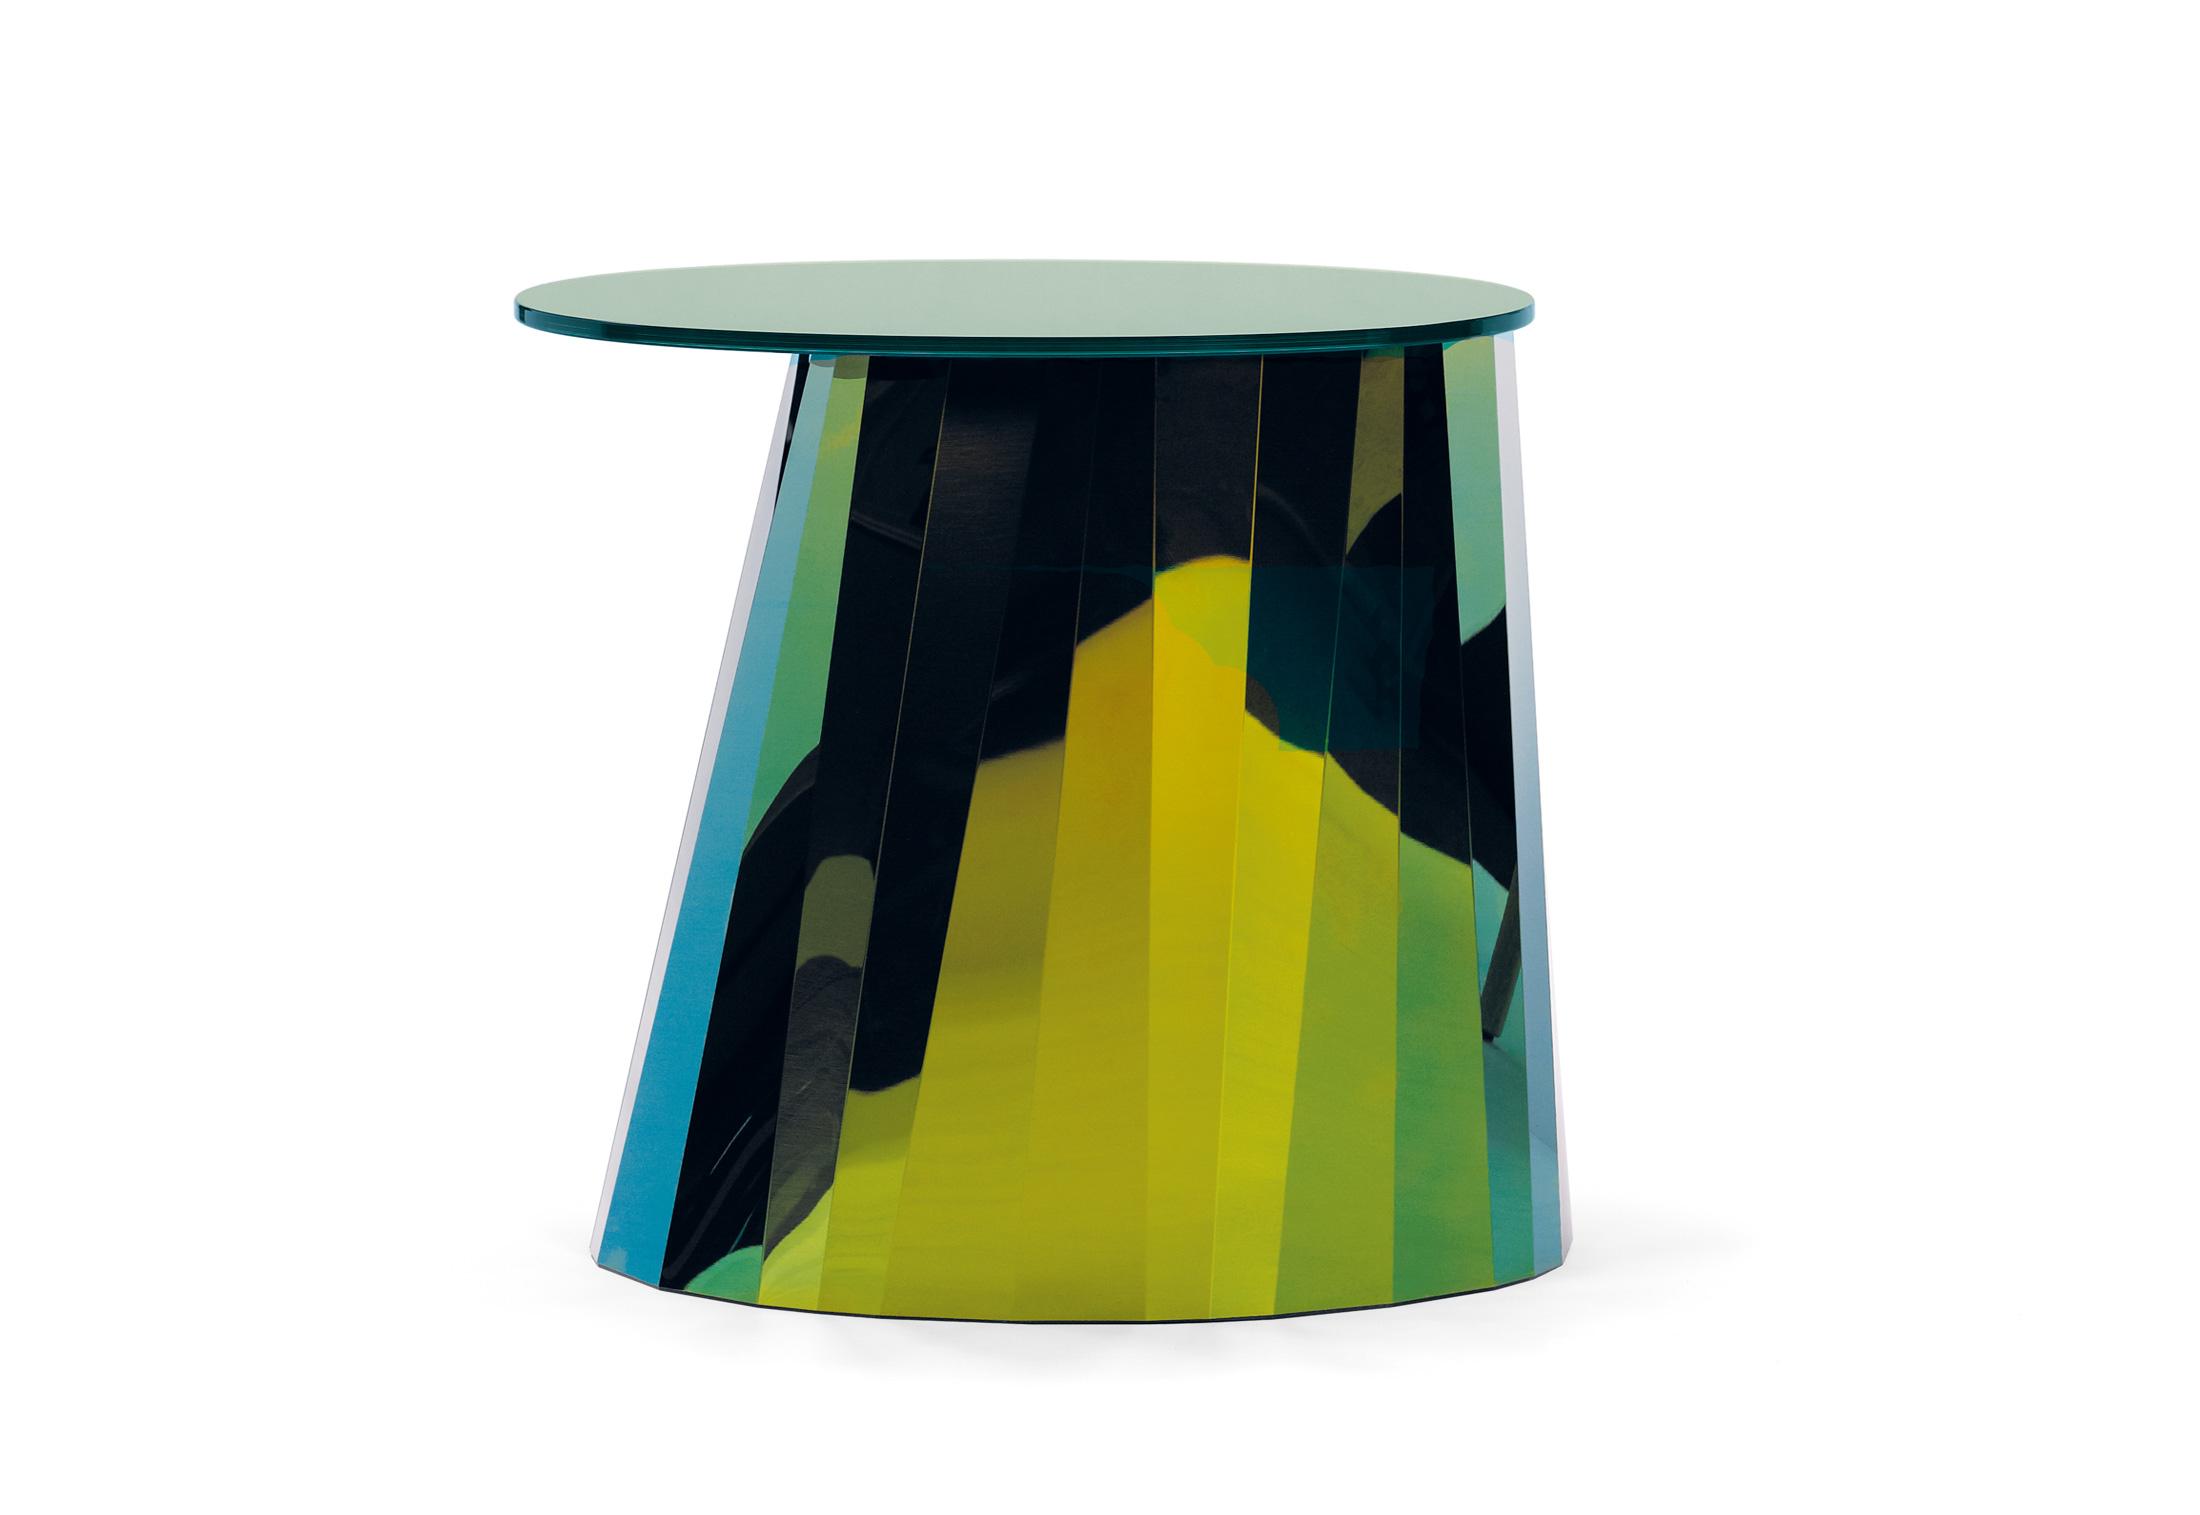 Pli Side Table by Victoria Wilmotte for ClassiCon